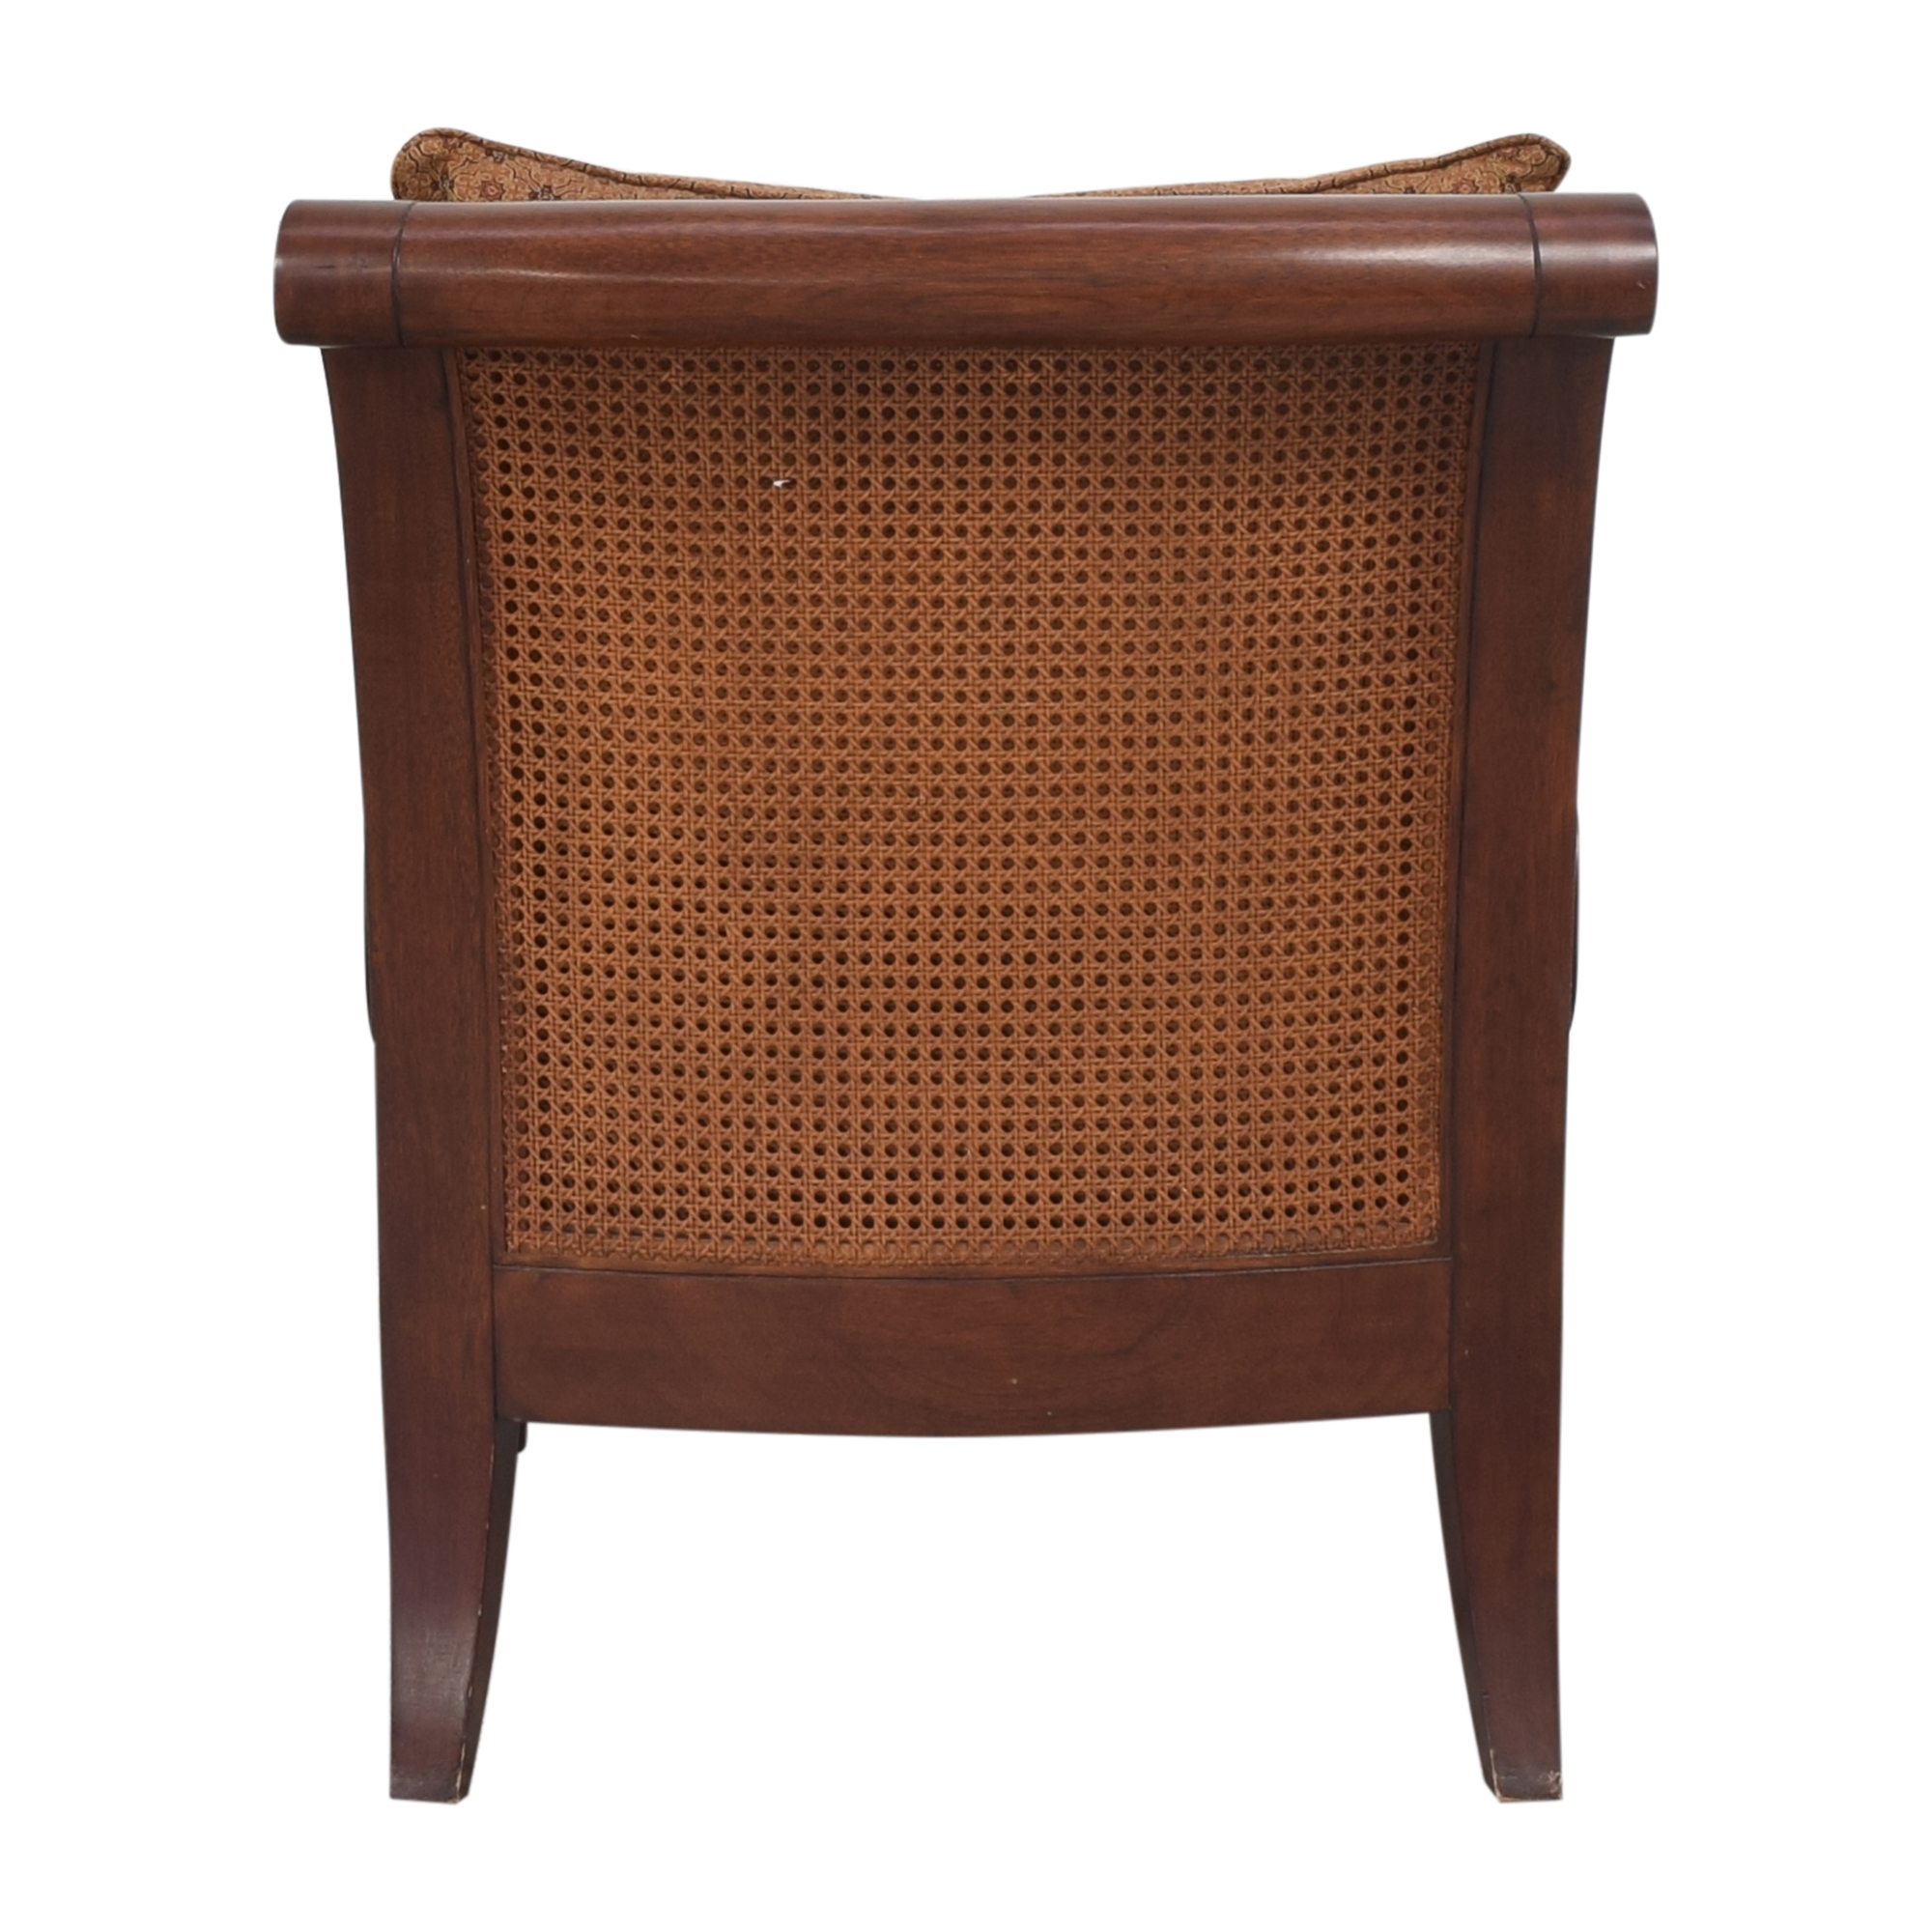 Ethan Allen Ethan Allen Berwick Chair used